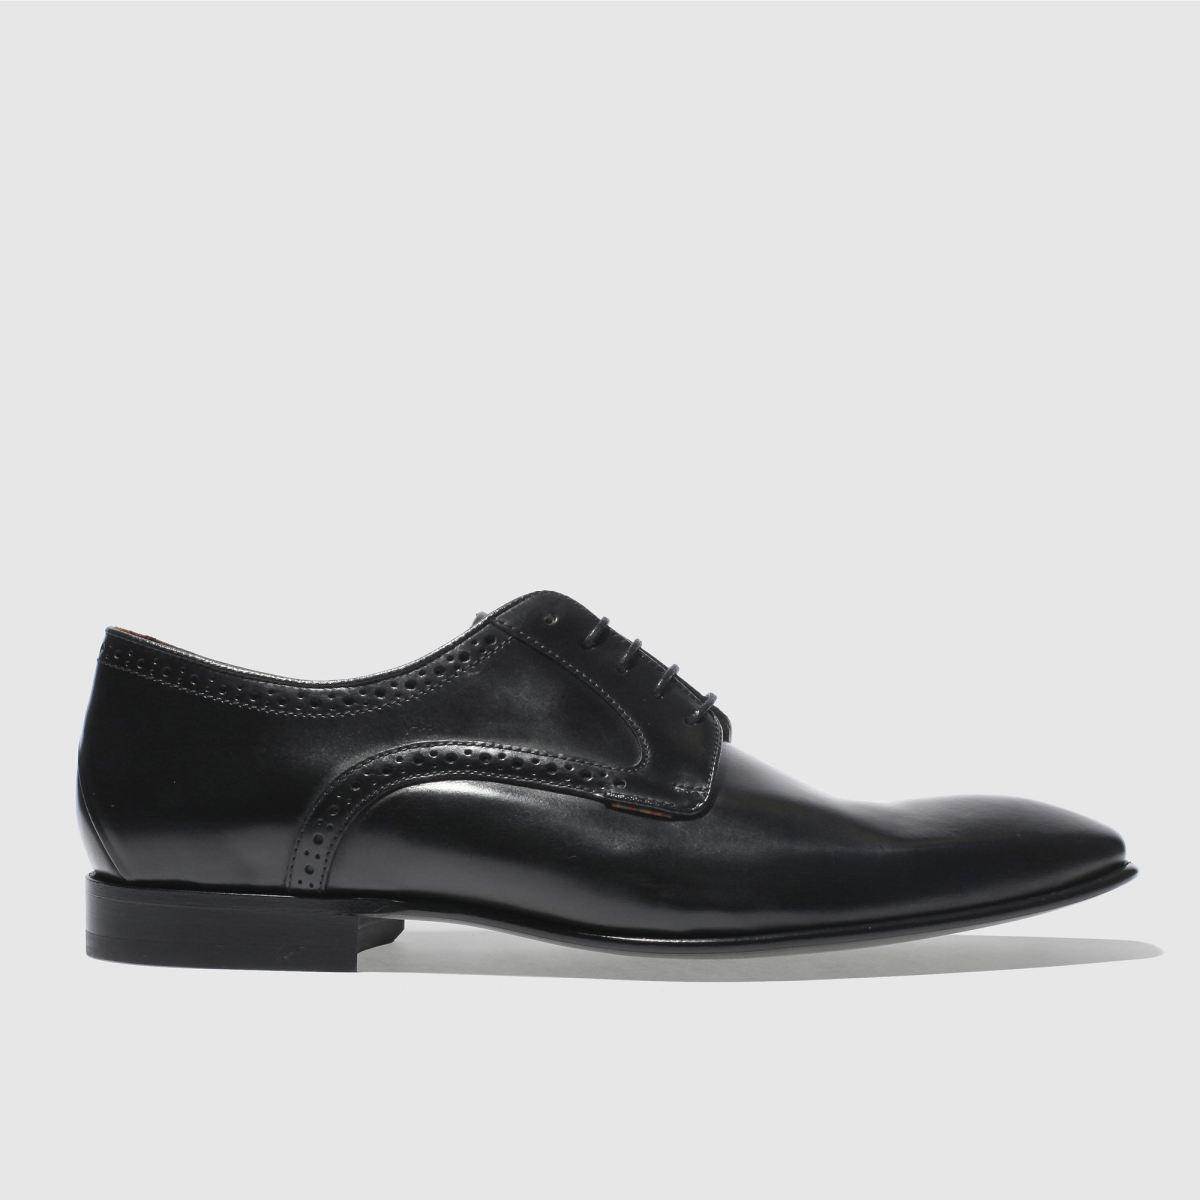 paul smith shoe ps Paul Smith Shoe Ps Black Roth Shoes